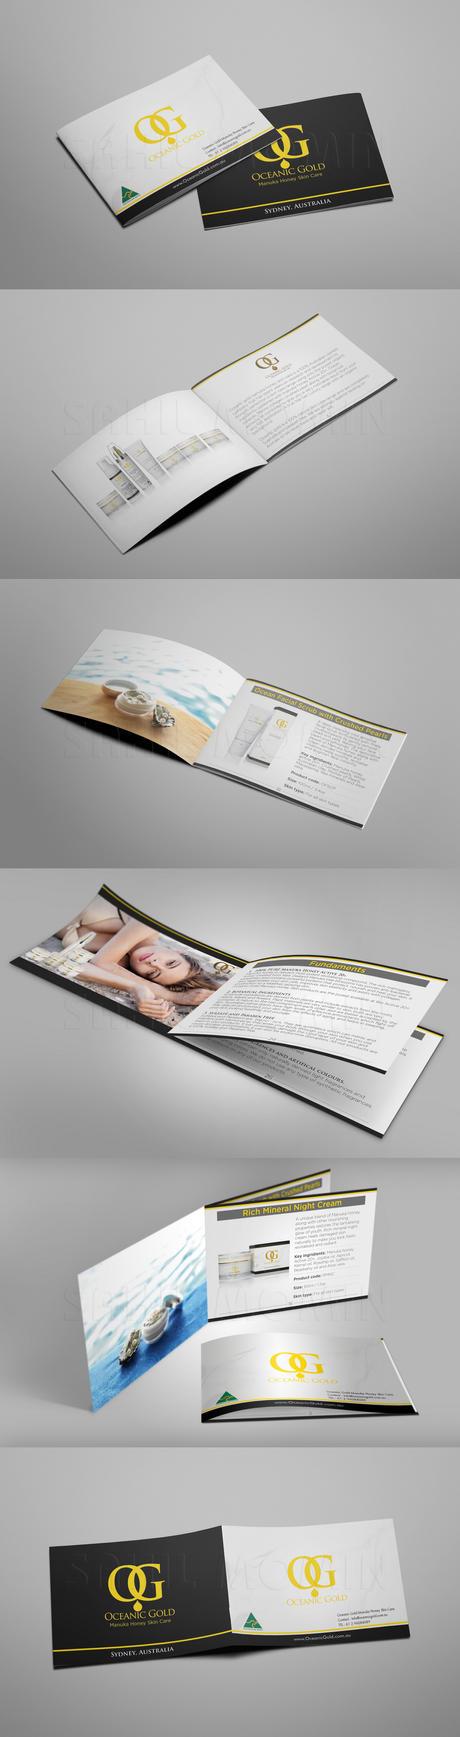 Oceanic Gold Catalogue by sahilmomin5